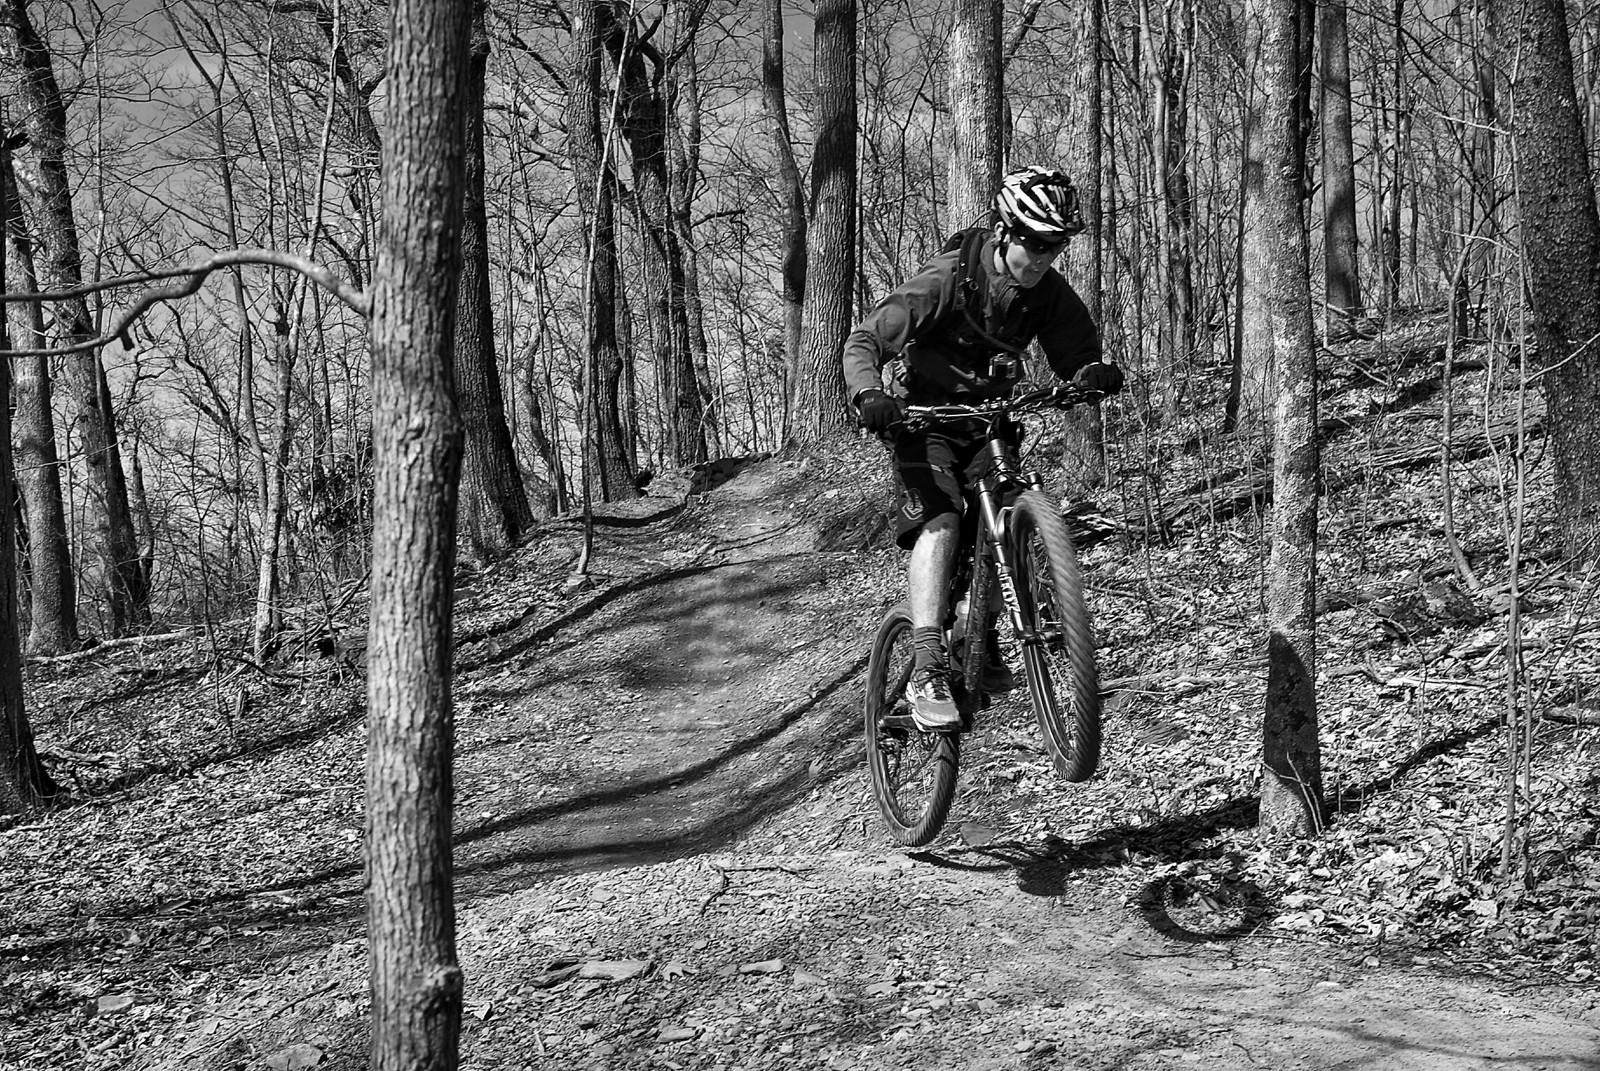 IMG 2840 - Ladavis83 - Mountain Biking Pictures - Vital MTB